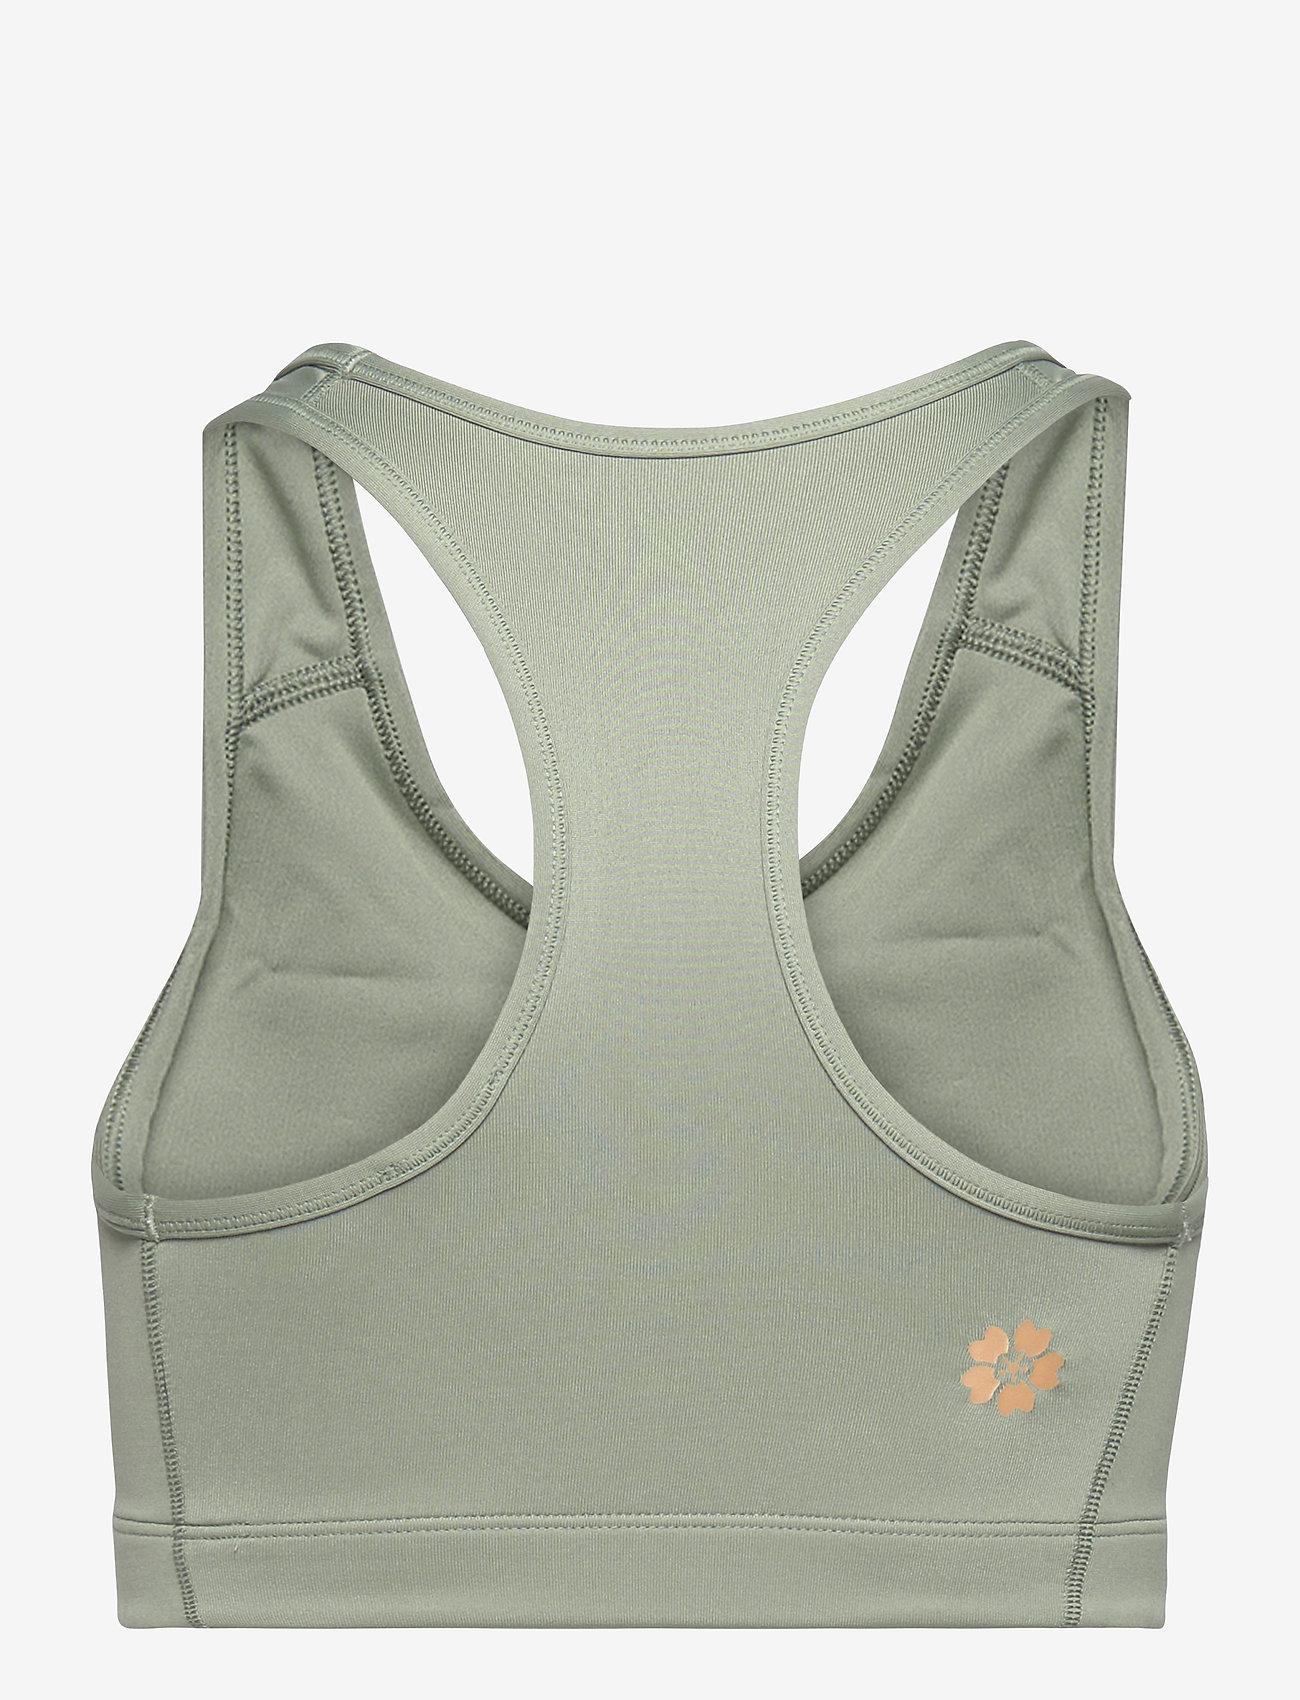 Asics - SAKURA ASICS SPIRAL BRA - sport bras: medium - slate grey - 1